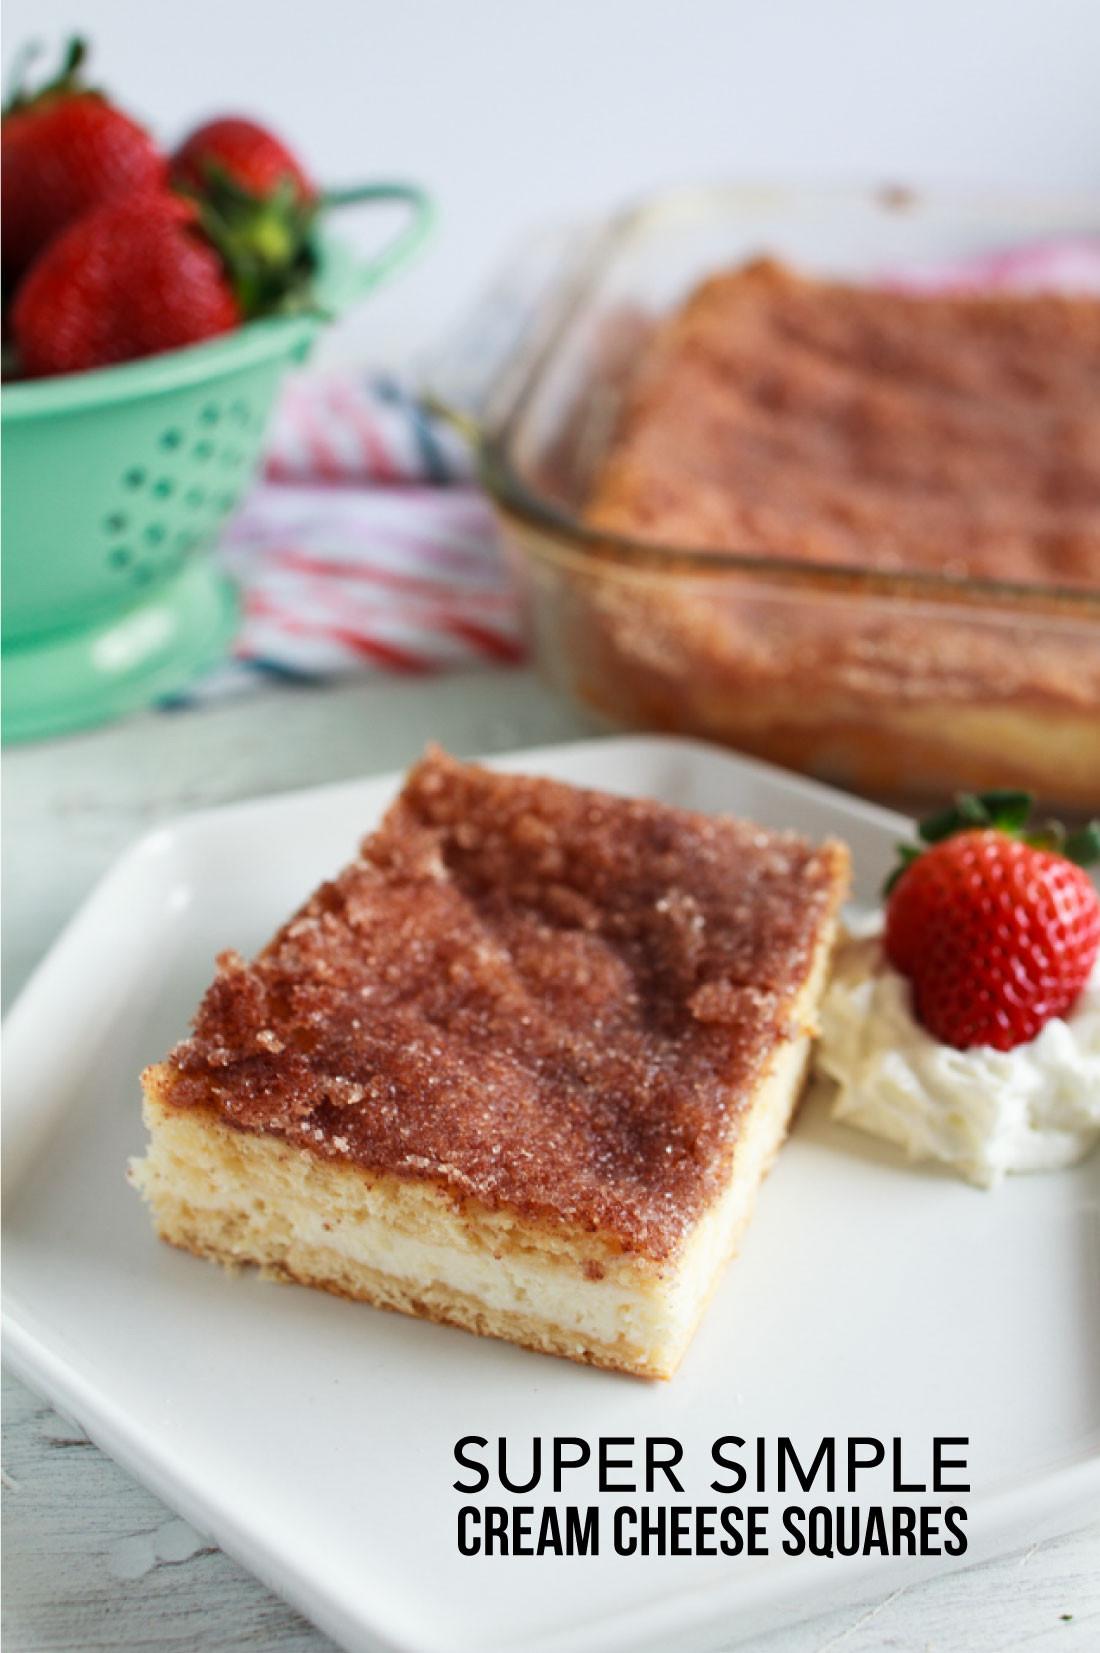 Desserts To Make With Cream Cheese  Super Simple Cream Cheese Squares Dessert